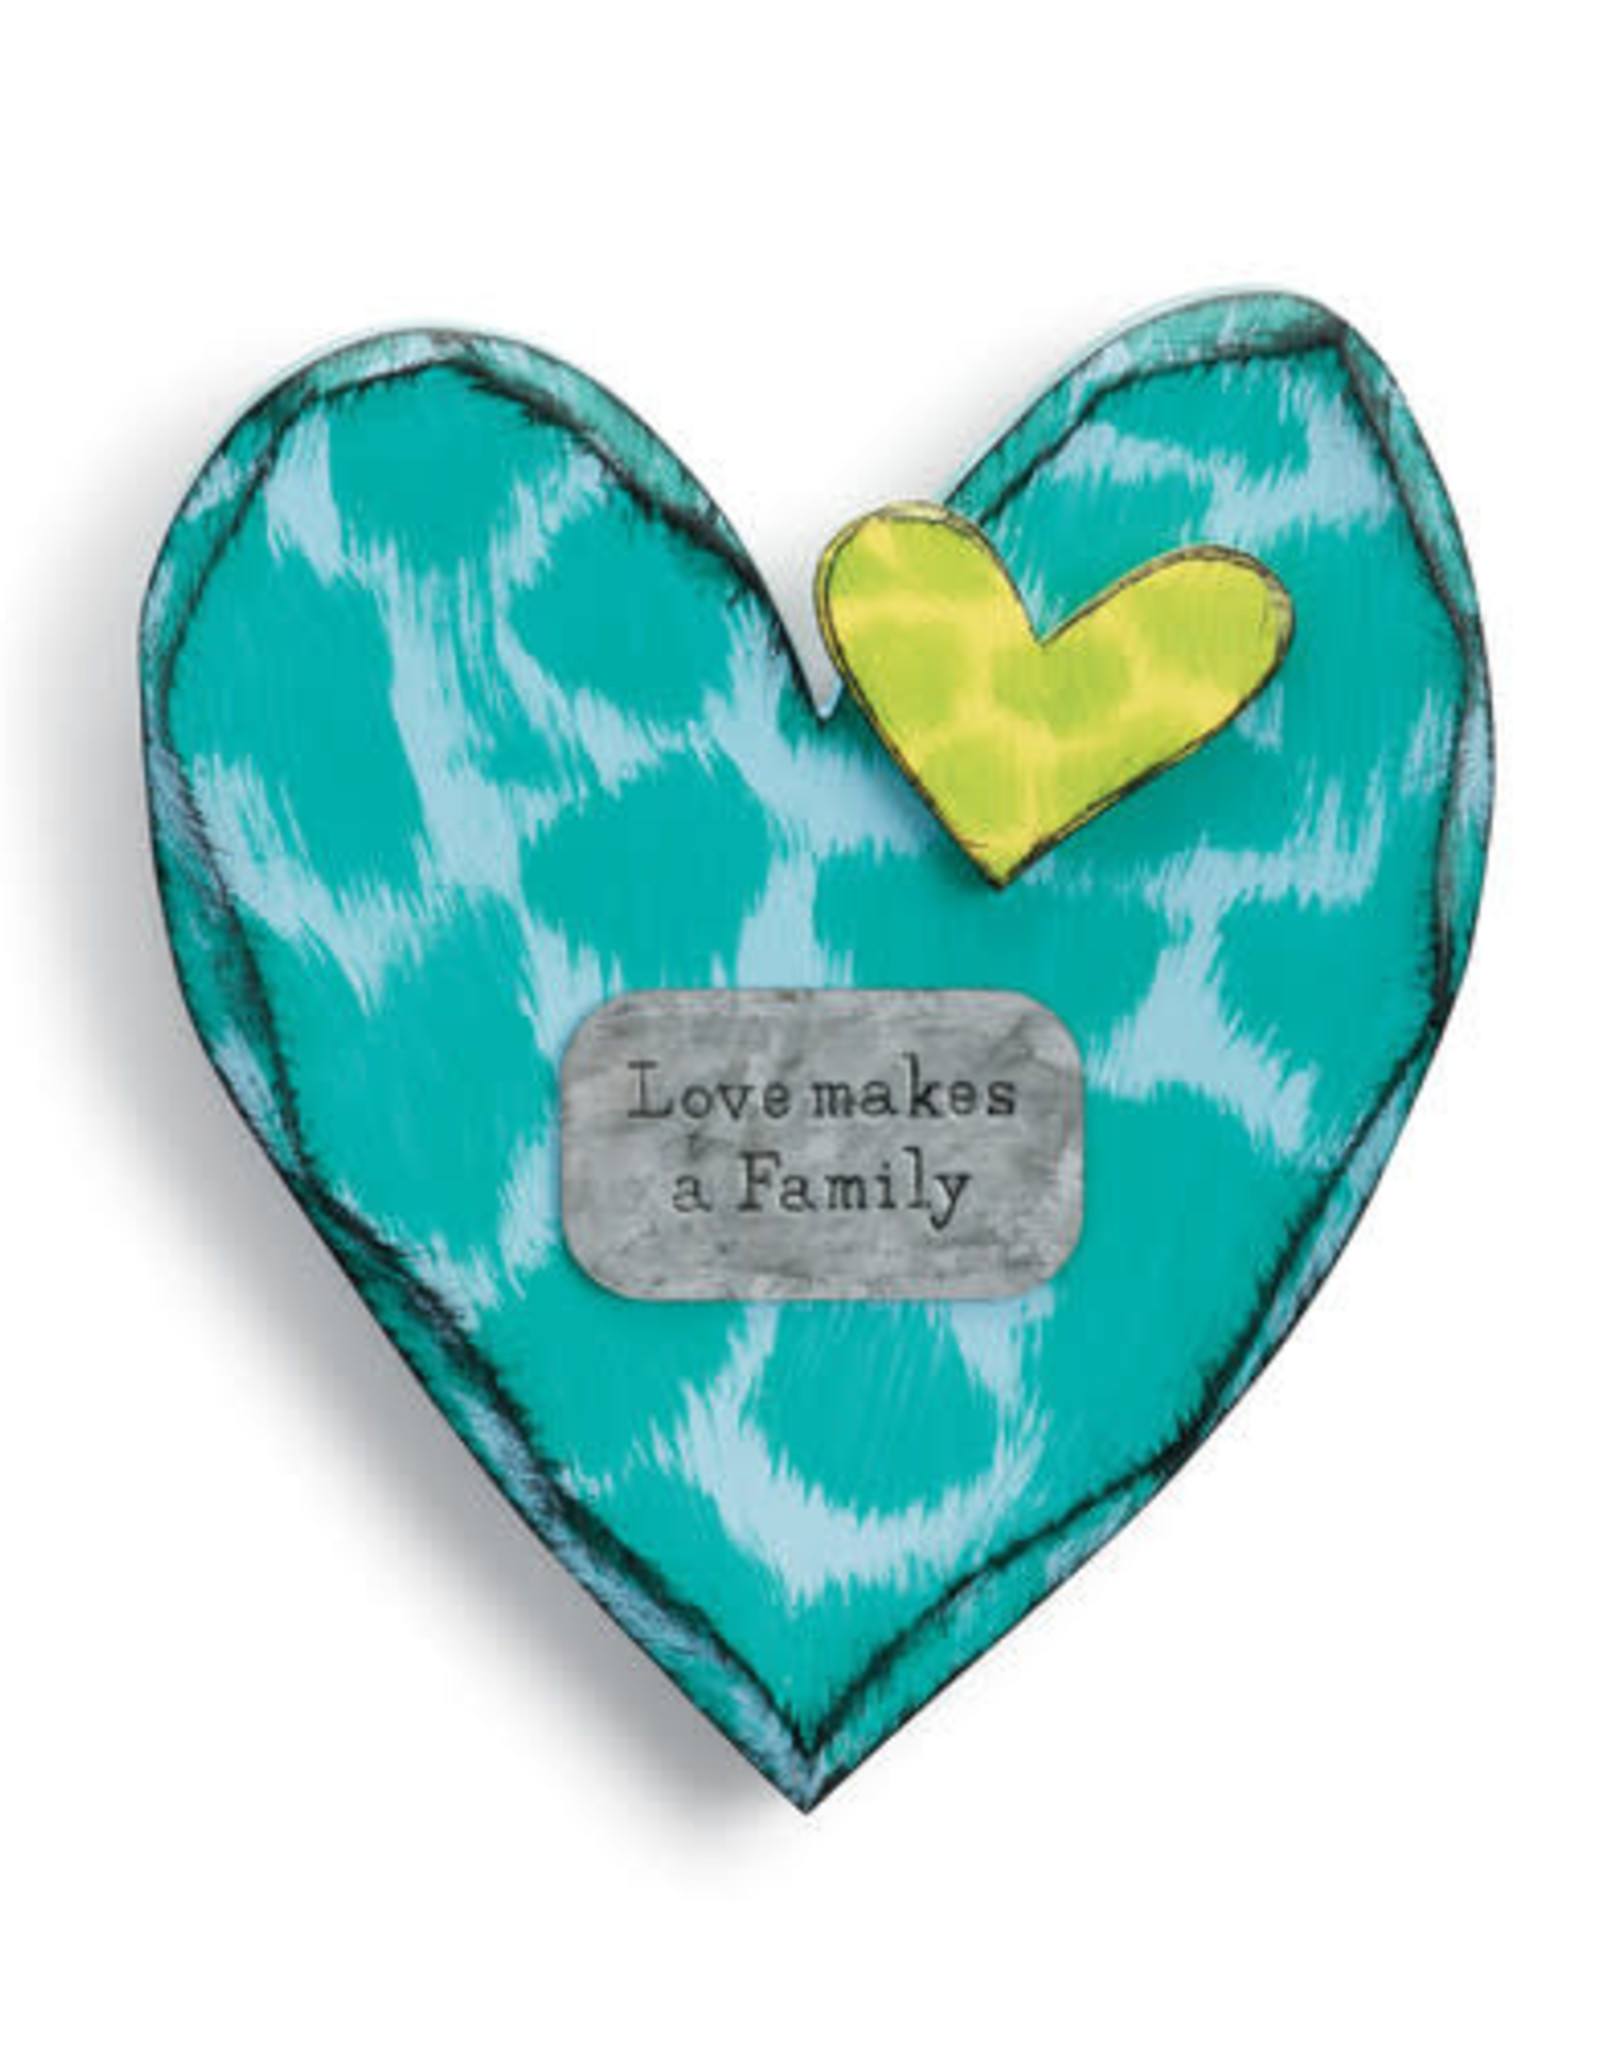 Tracy Pesche Love Makes a Family Wall Heart